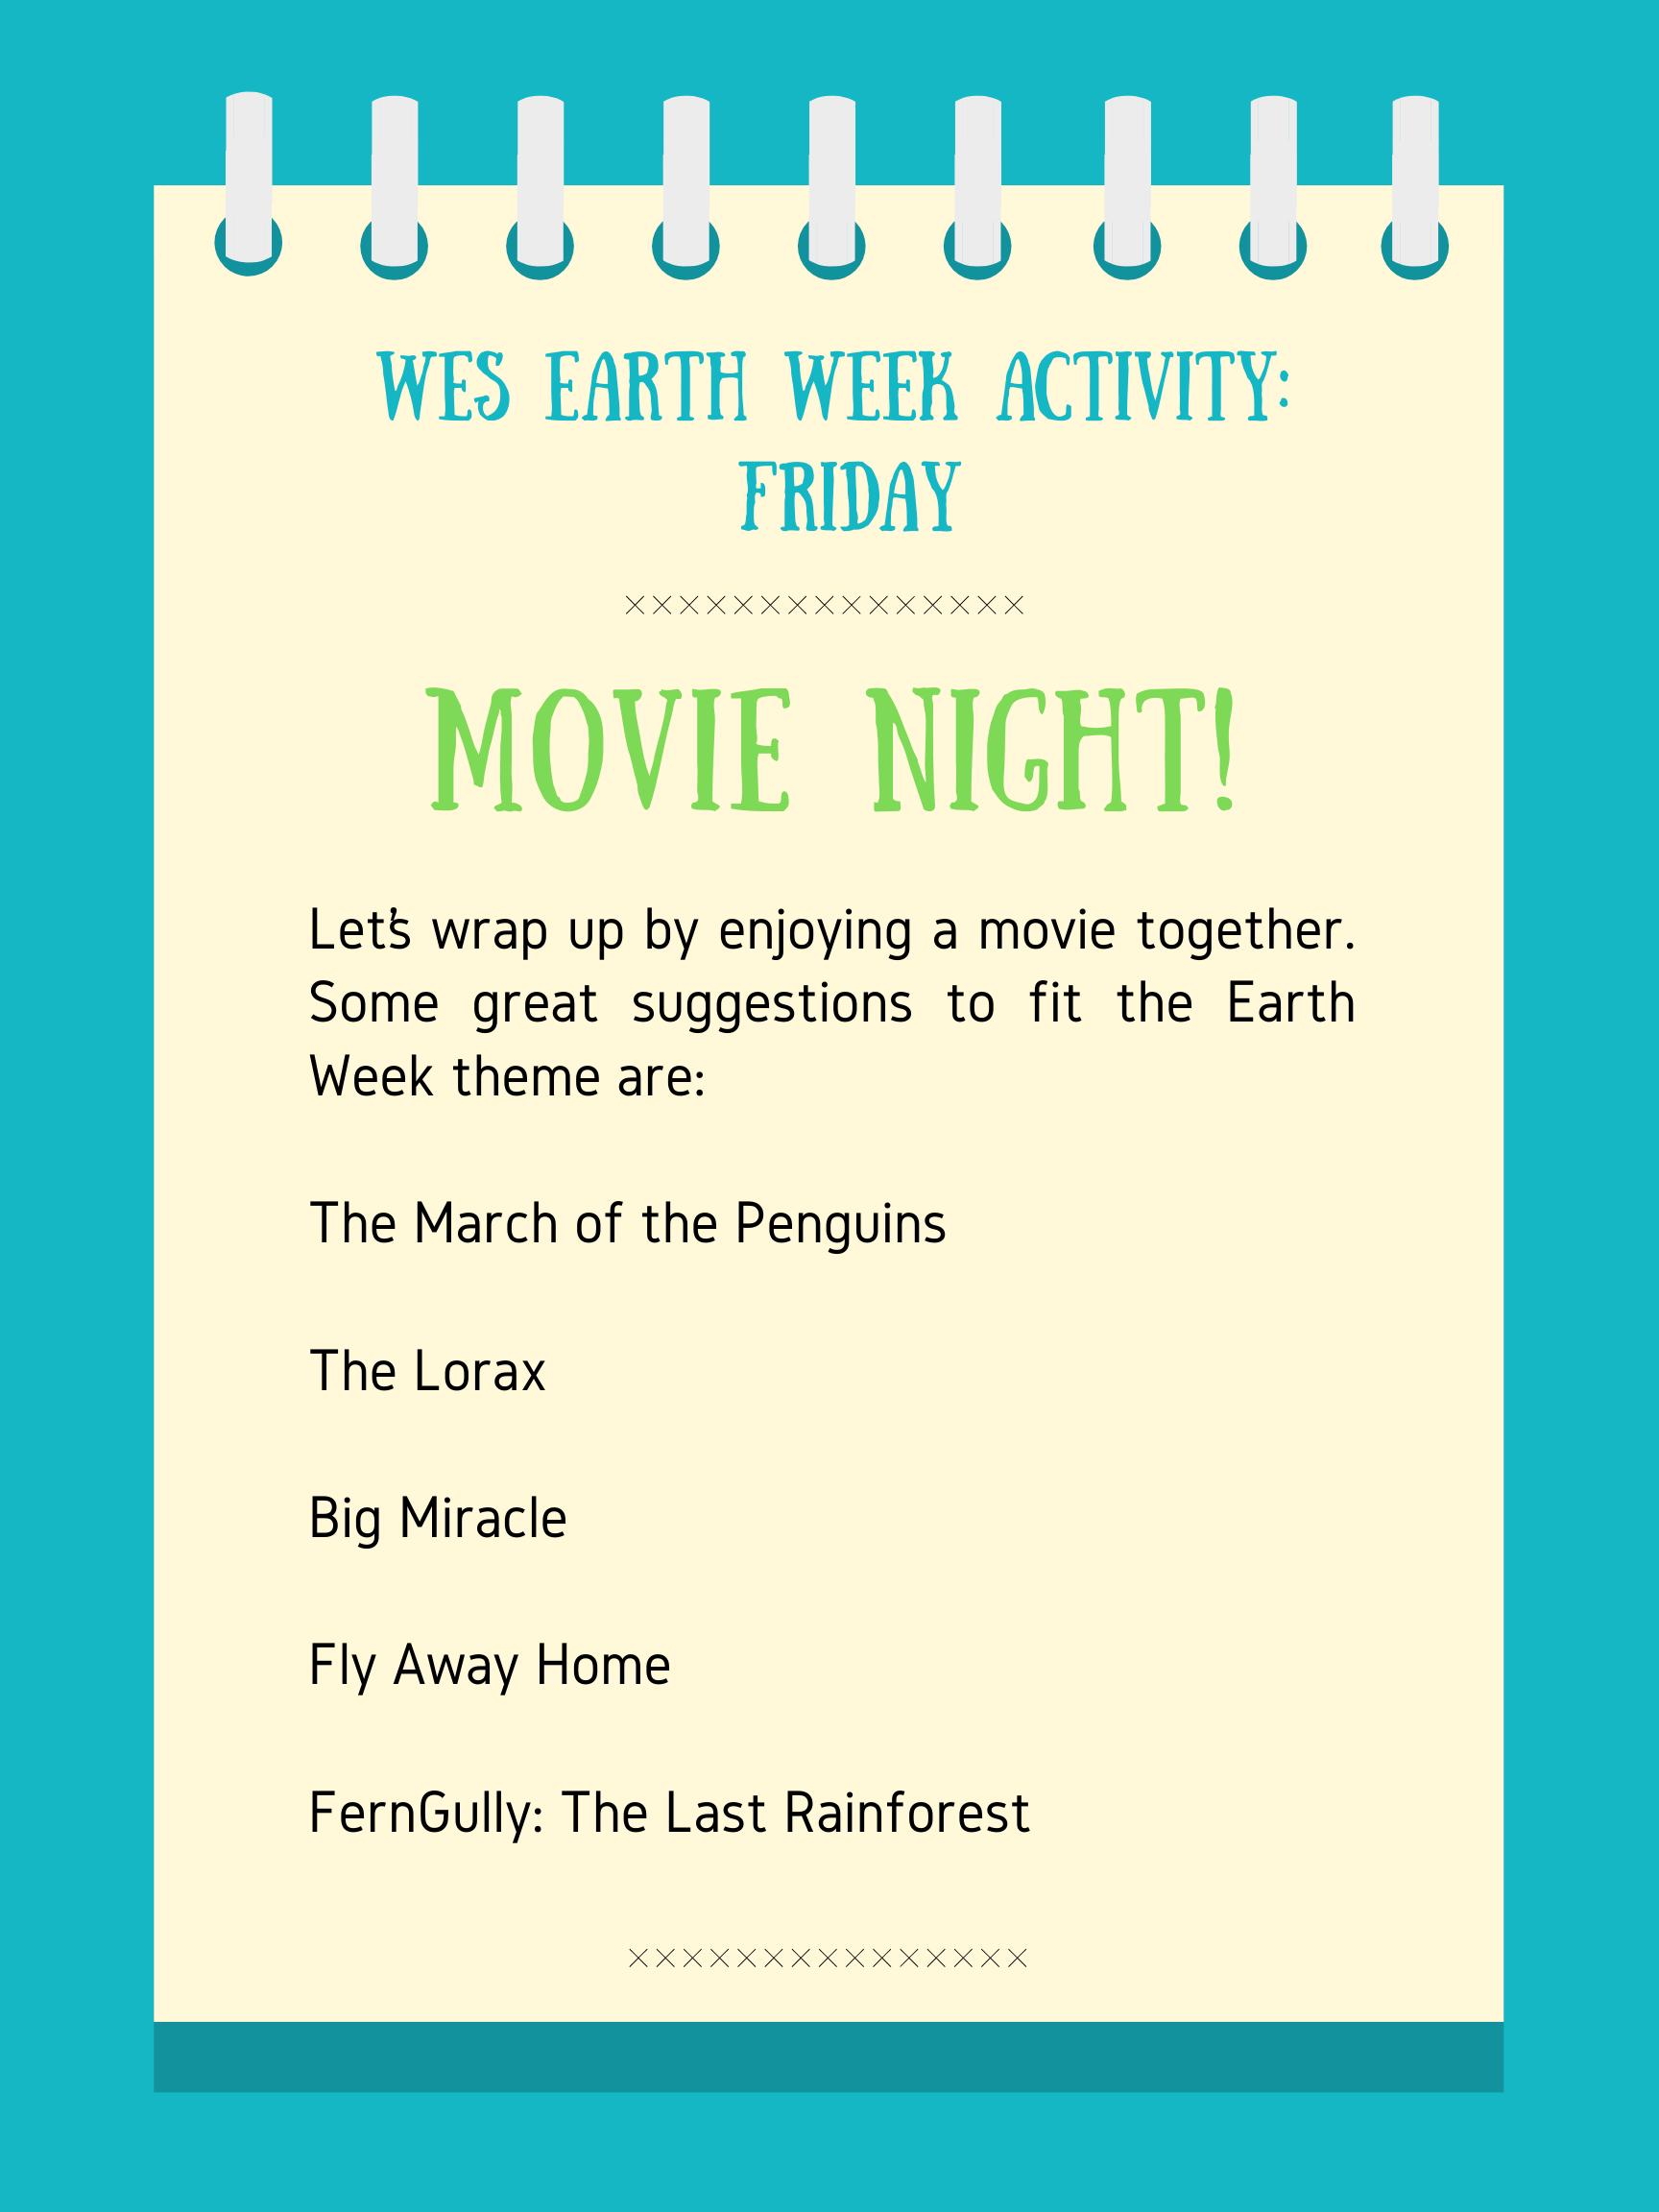 Earth Week Activities – Friday – Warman Elementary School Intended For Sun Prairie School District Calendar